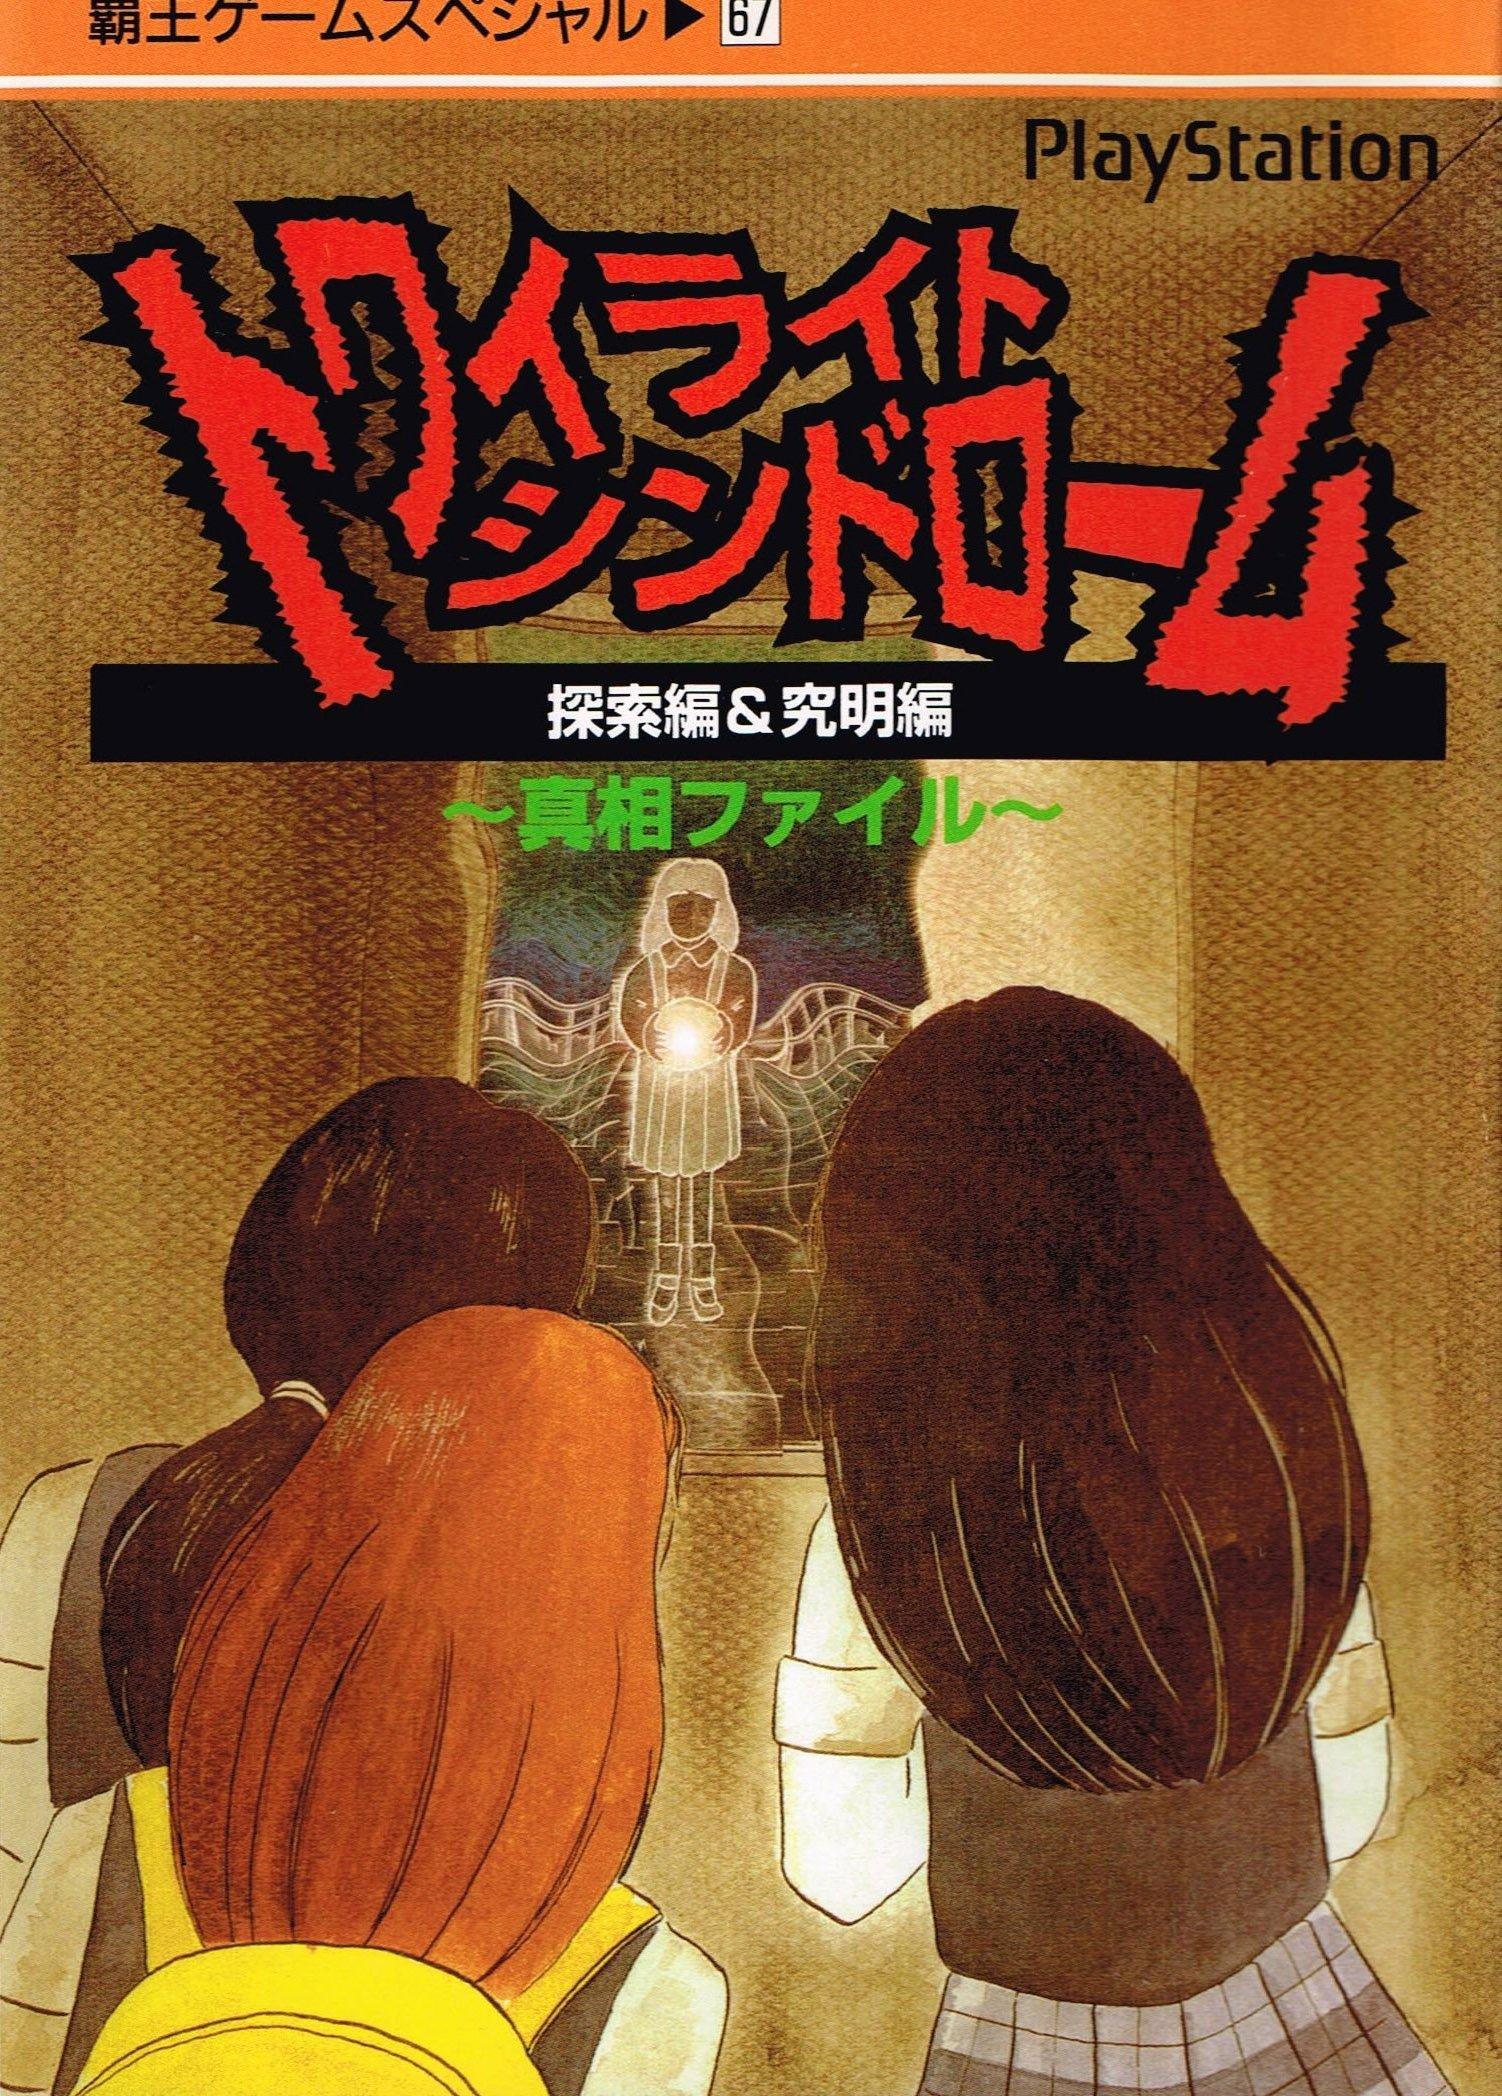 Twilight Syndrome: Tansaku-hen & Kyuumei-hen ~ Shinsou File